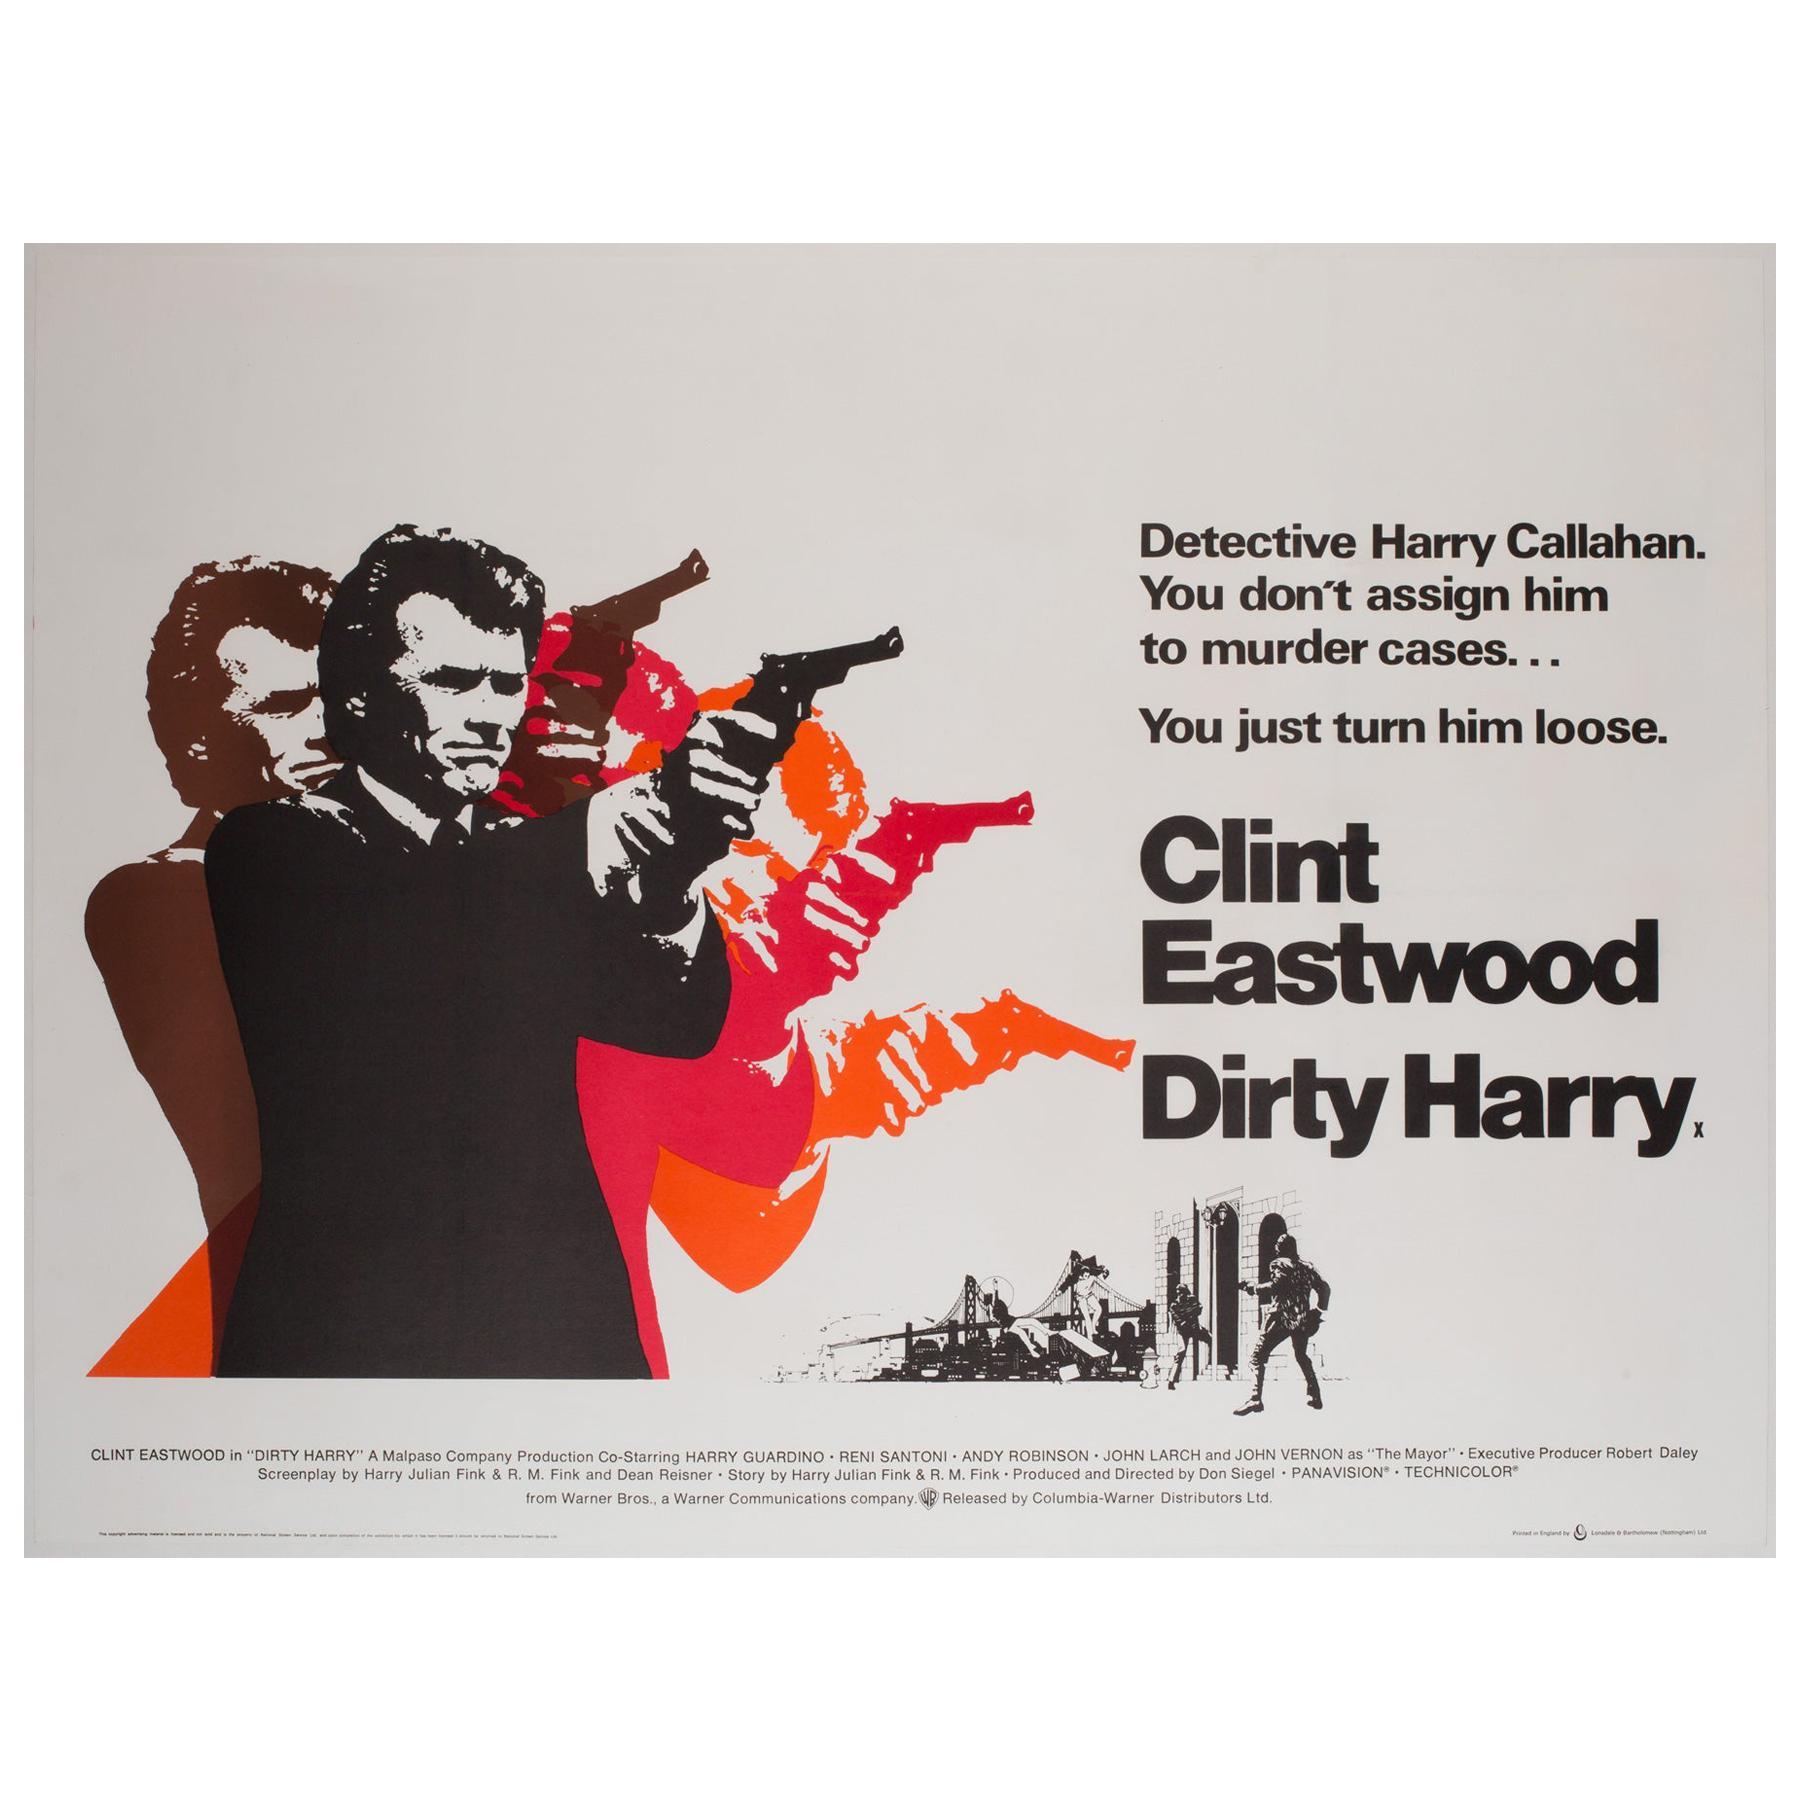 Dirty Harry Original UK Film Poster, 1971, Client Eastwood